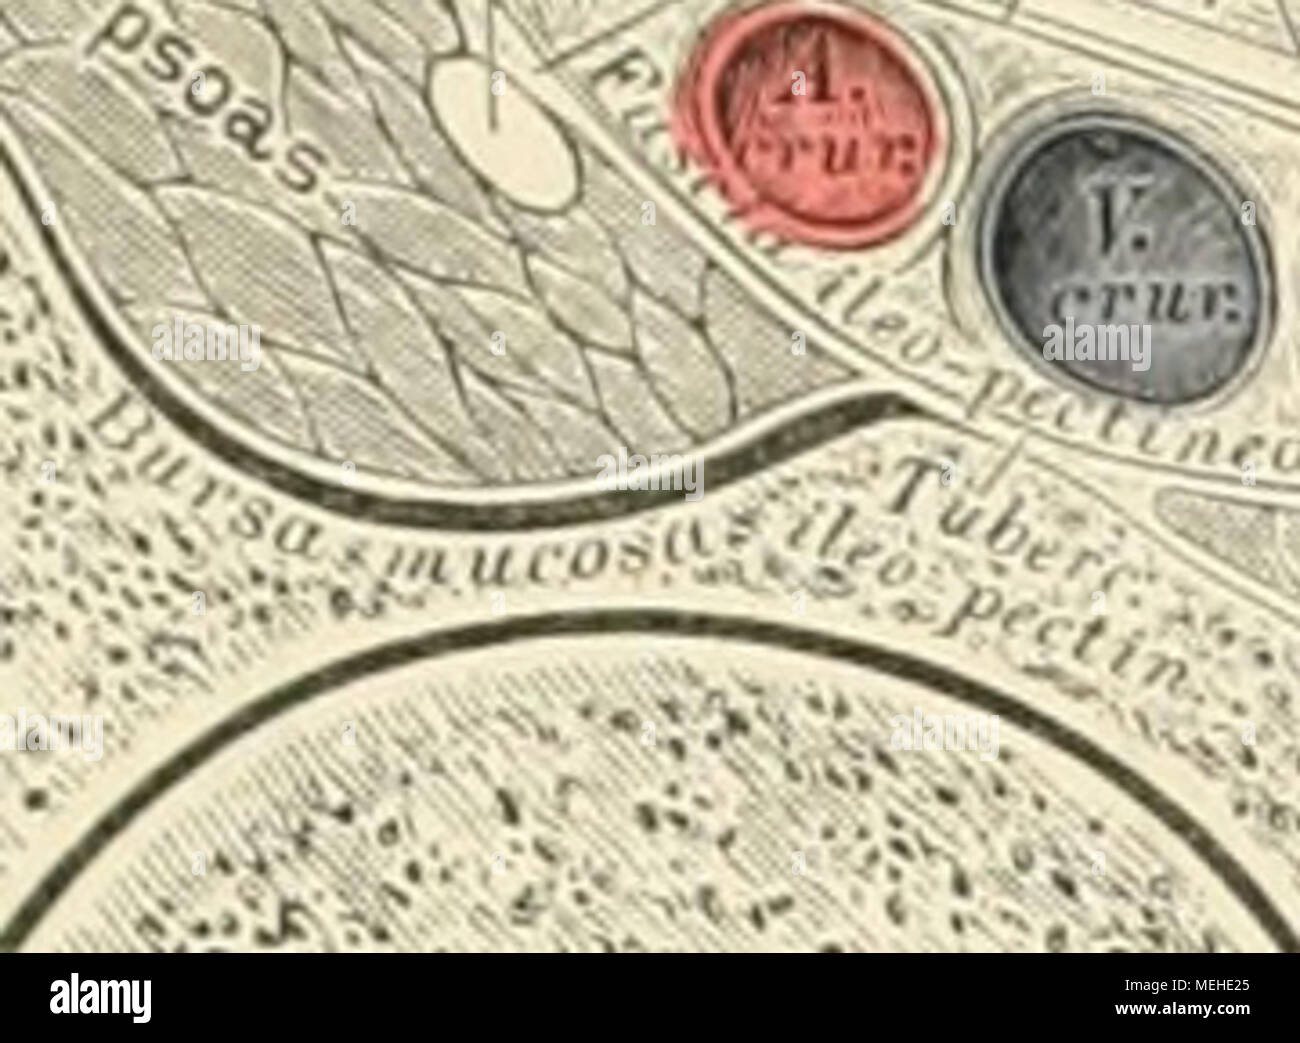 Ligamentum Stockfotos & Ligamentum Bilder - Alamy